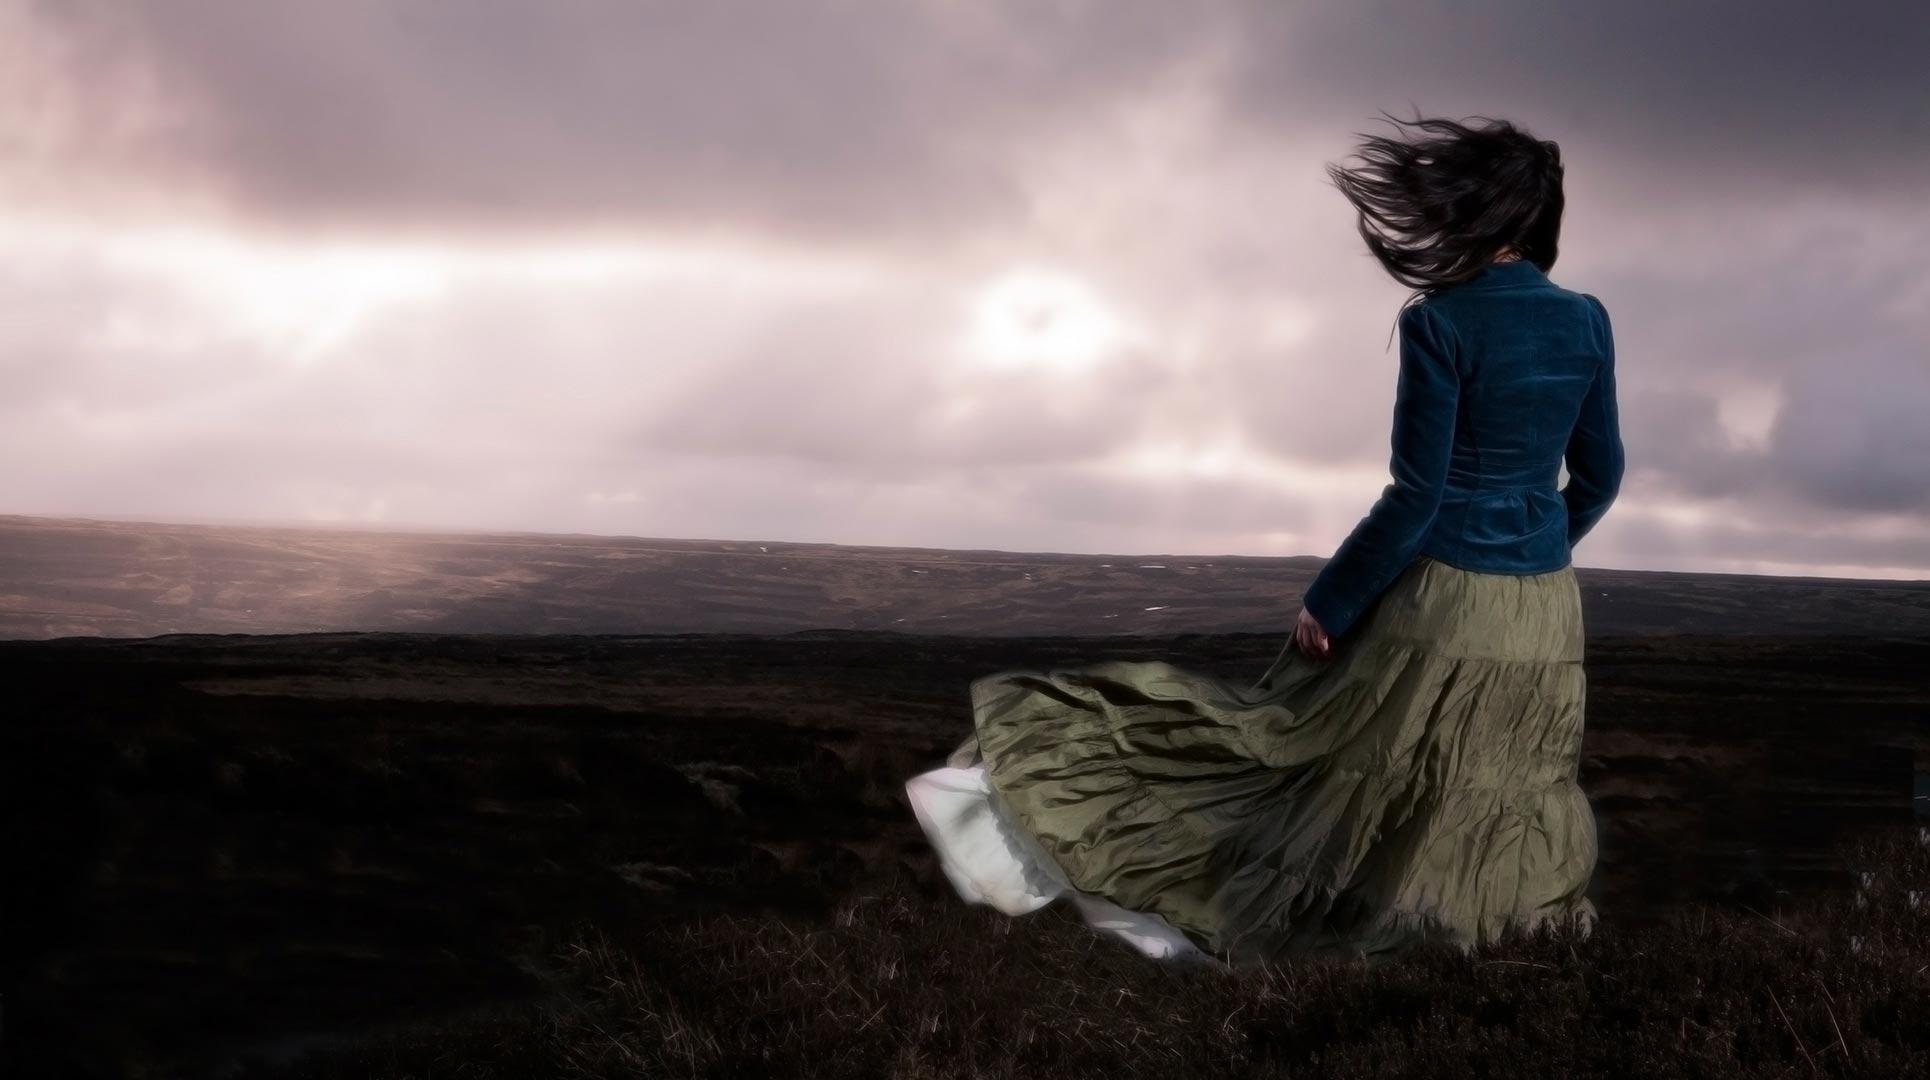 Nicola_Taylor_Art_Photography_Stormy_Skies_1